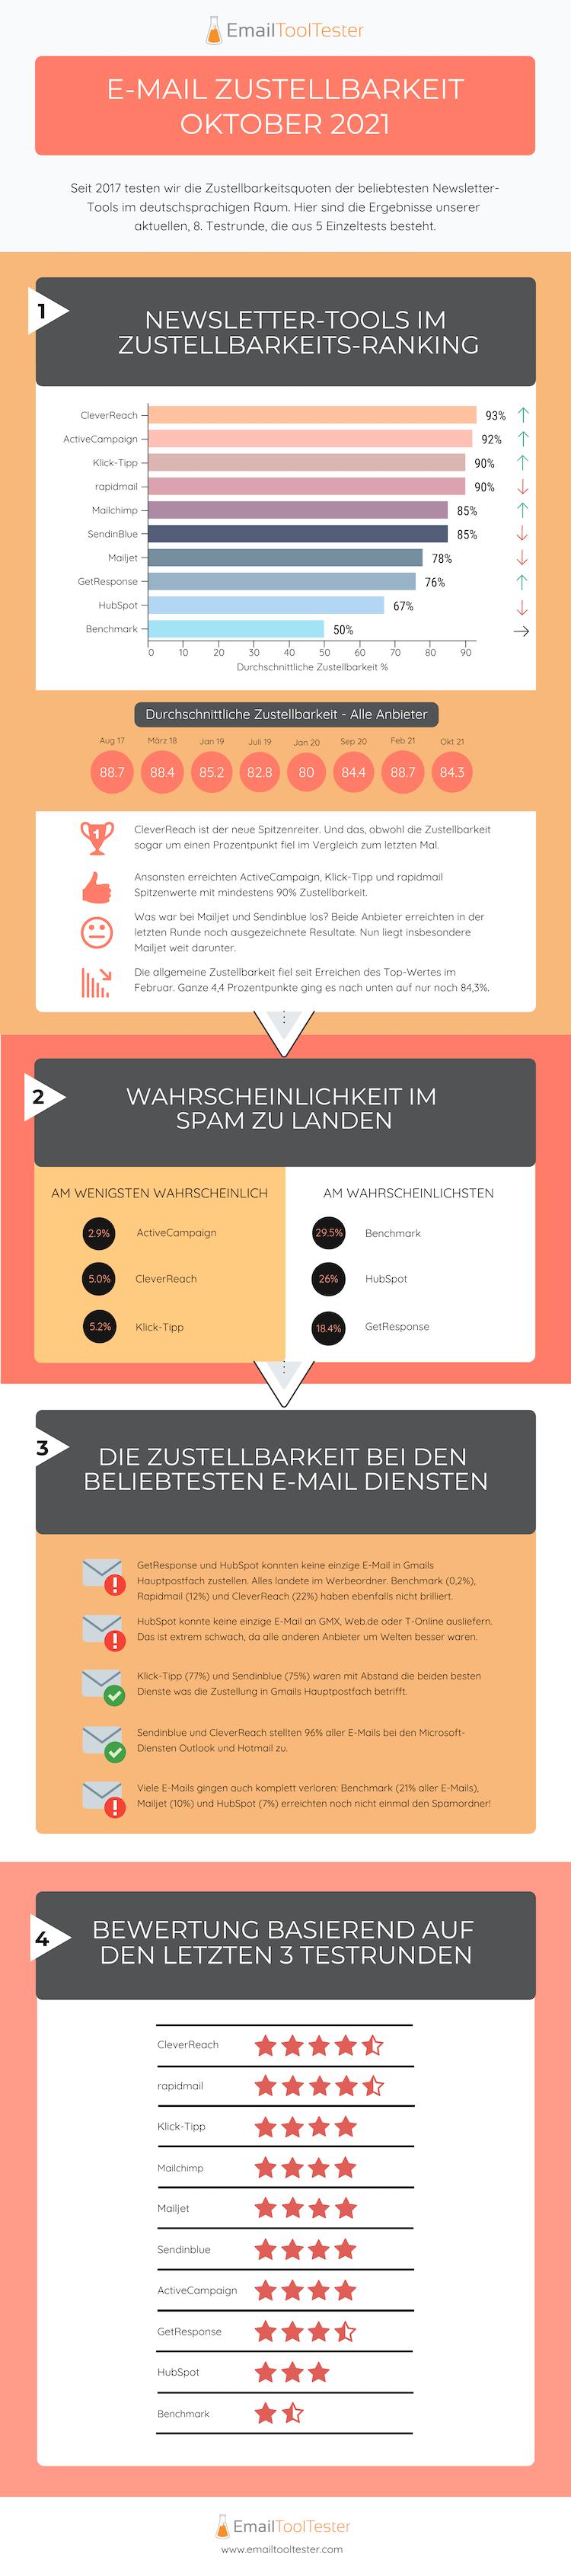 infografik zustellbarkeit oktober 2021